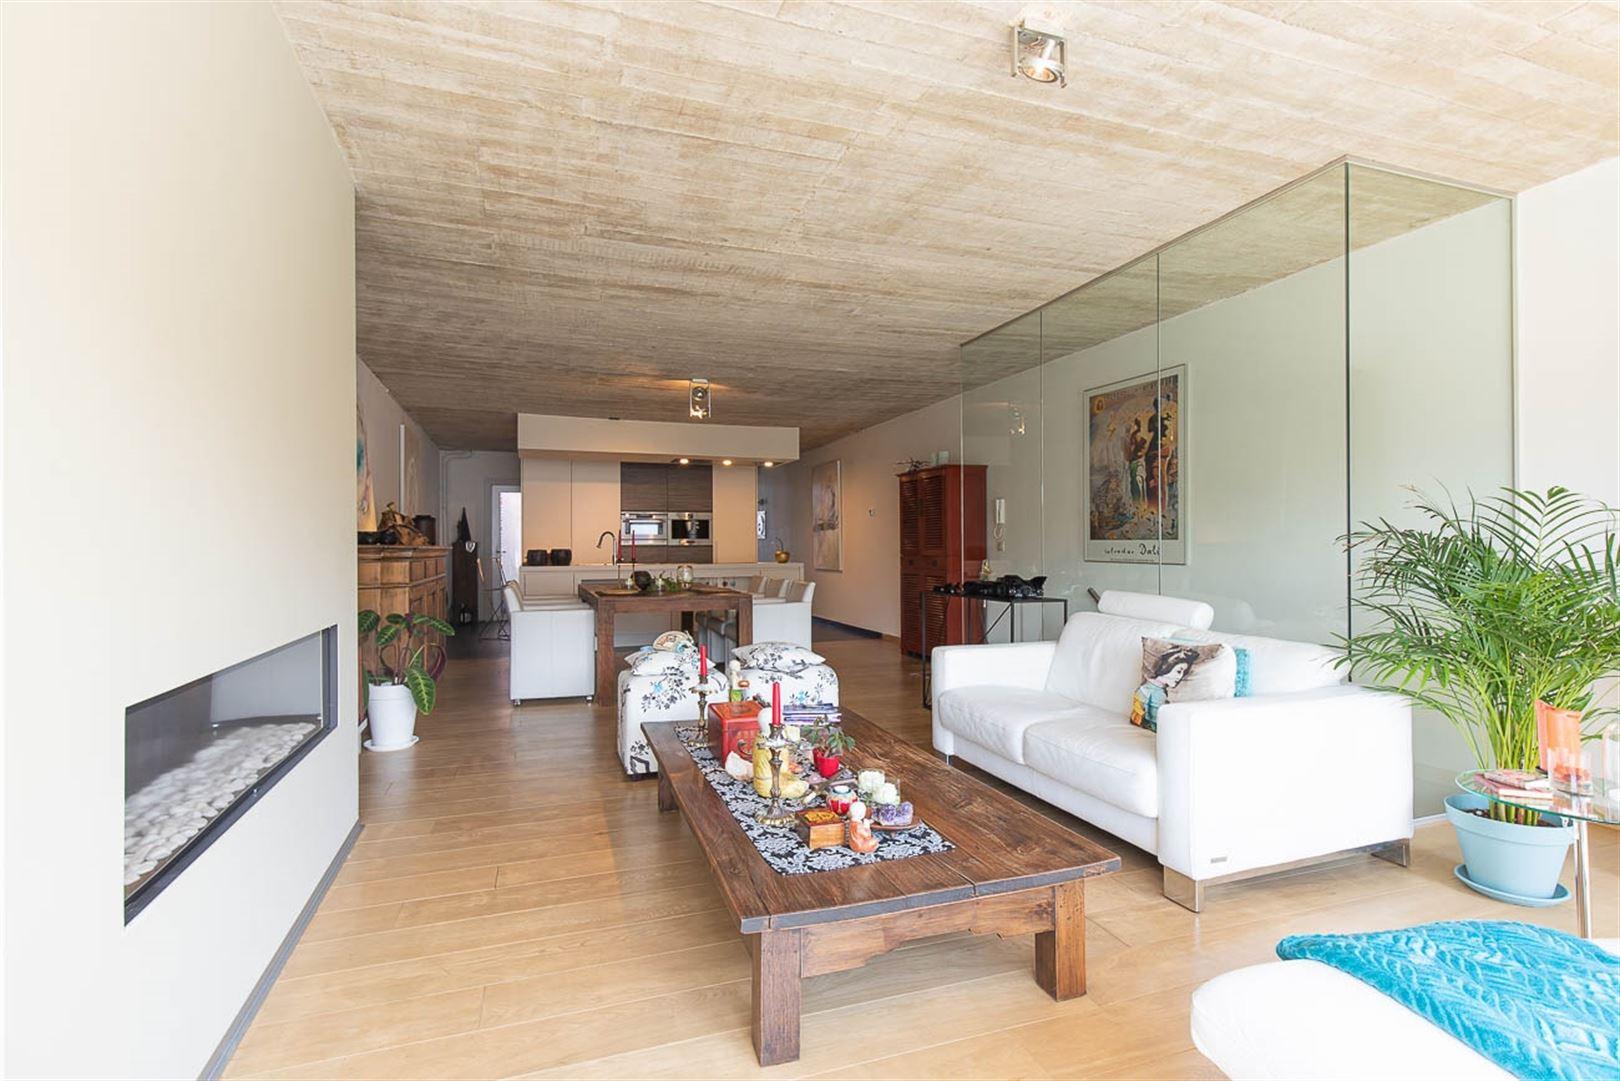 Foto 2 : Duplex/triplex te 9200 DENDERMONDE (België) - Prijs € 495.000